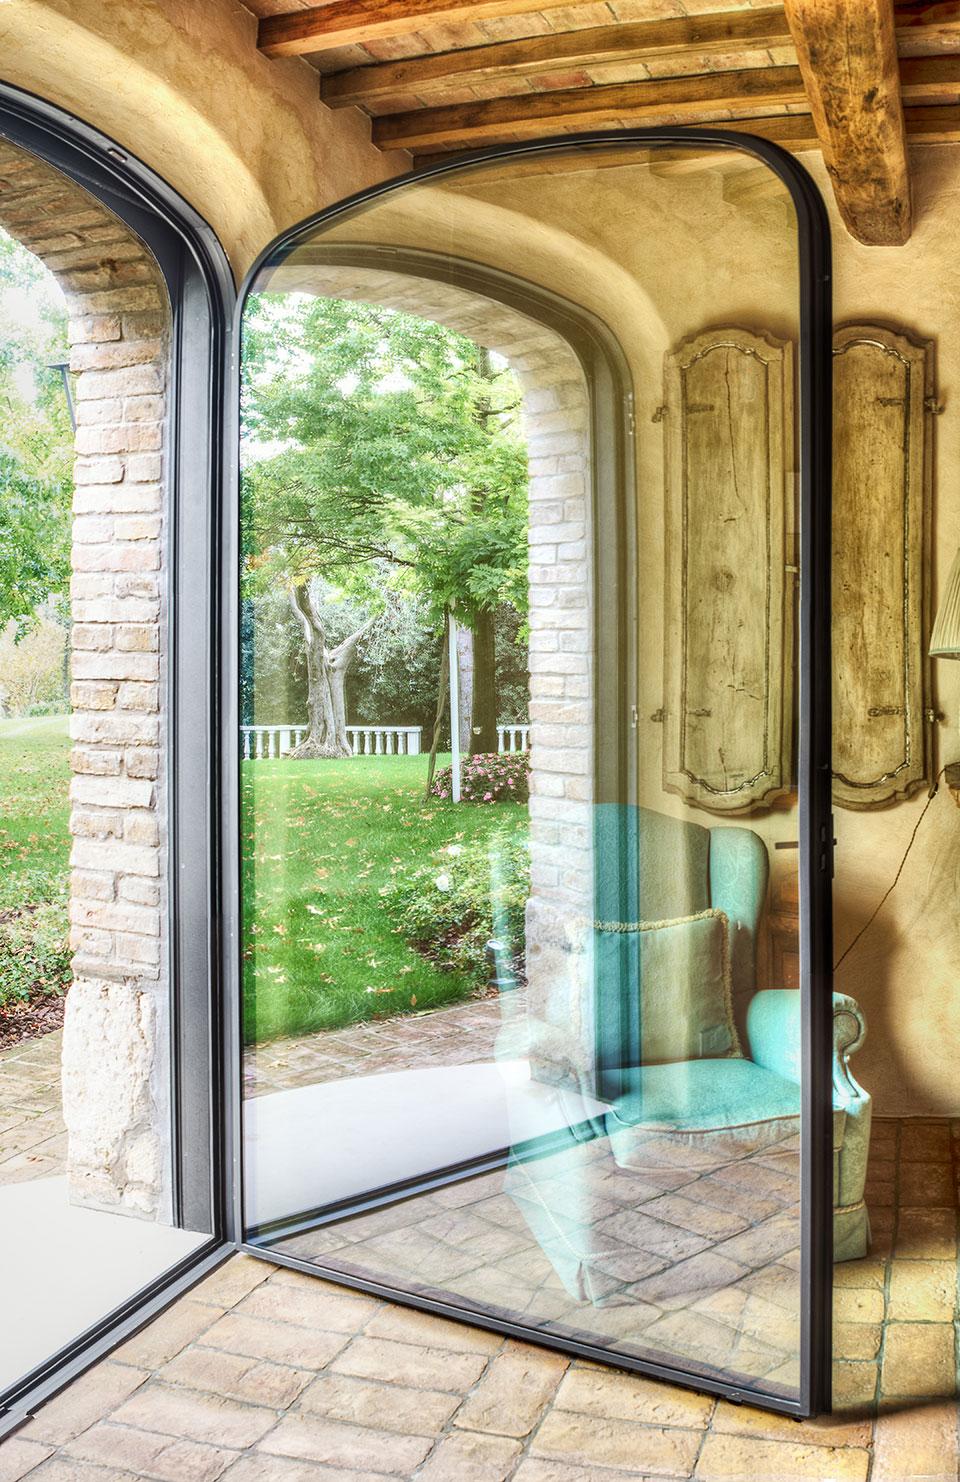 arch_arco_corten_door_finestram-window_garden_giardino_giommi_glass_minimal_personalised_personalizzato_porta_residential_residenziale_vetro_3